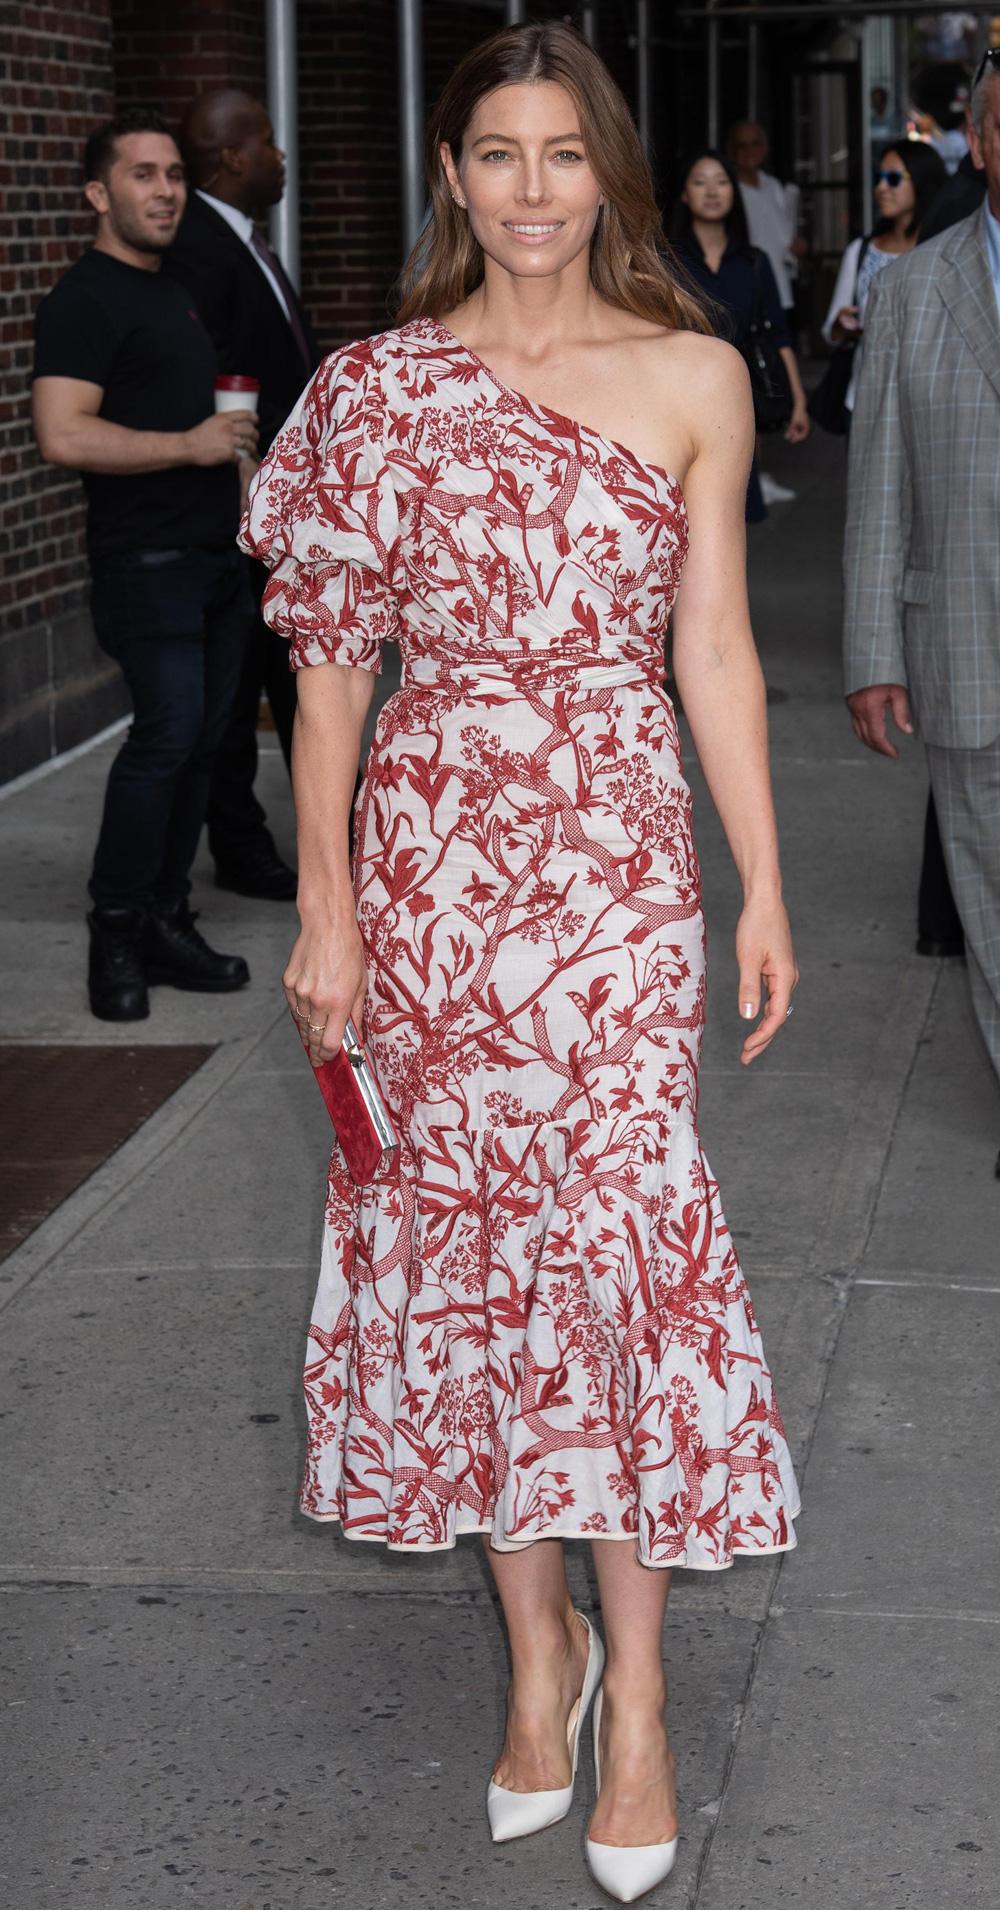 Jessica Biel In A Johanna Ortiz Dress And Louboutin Shoes